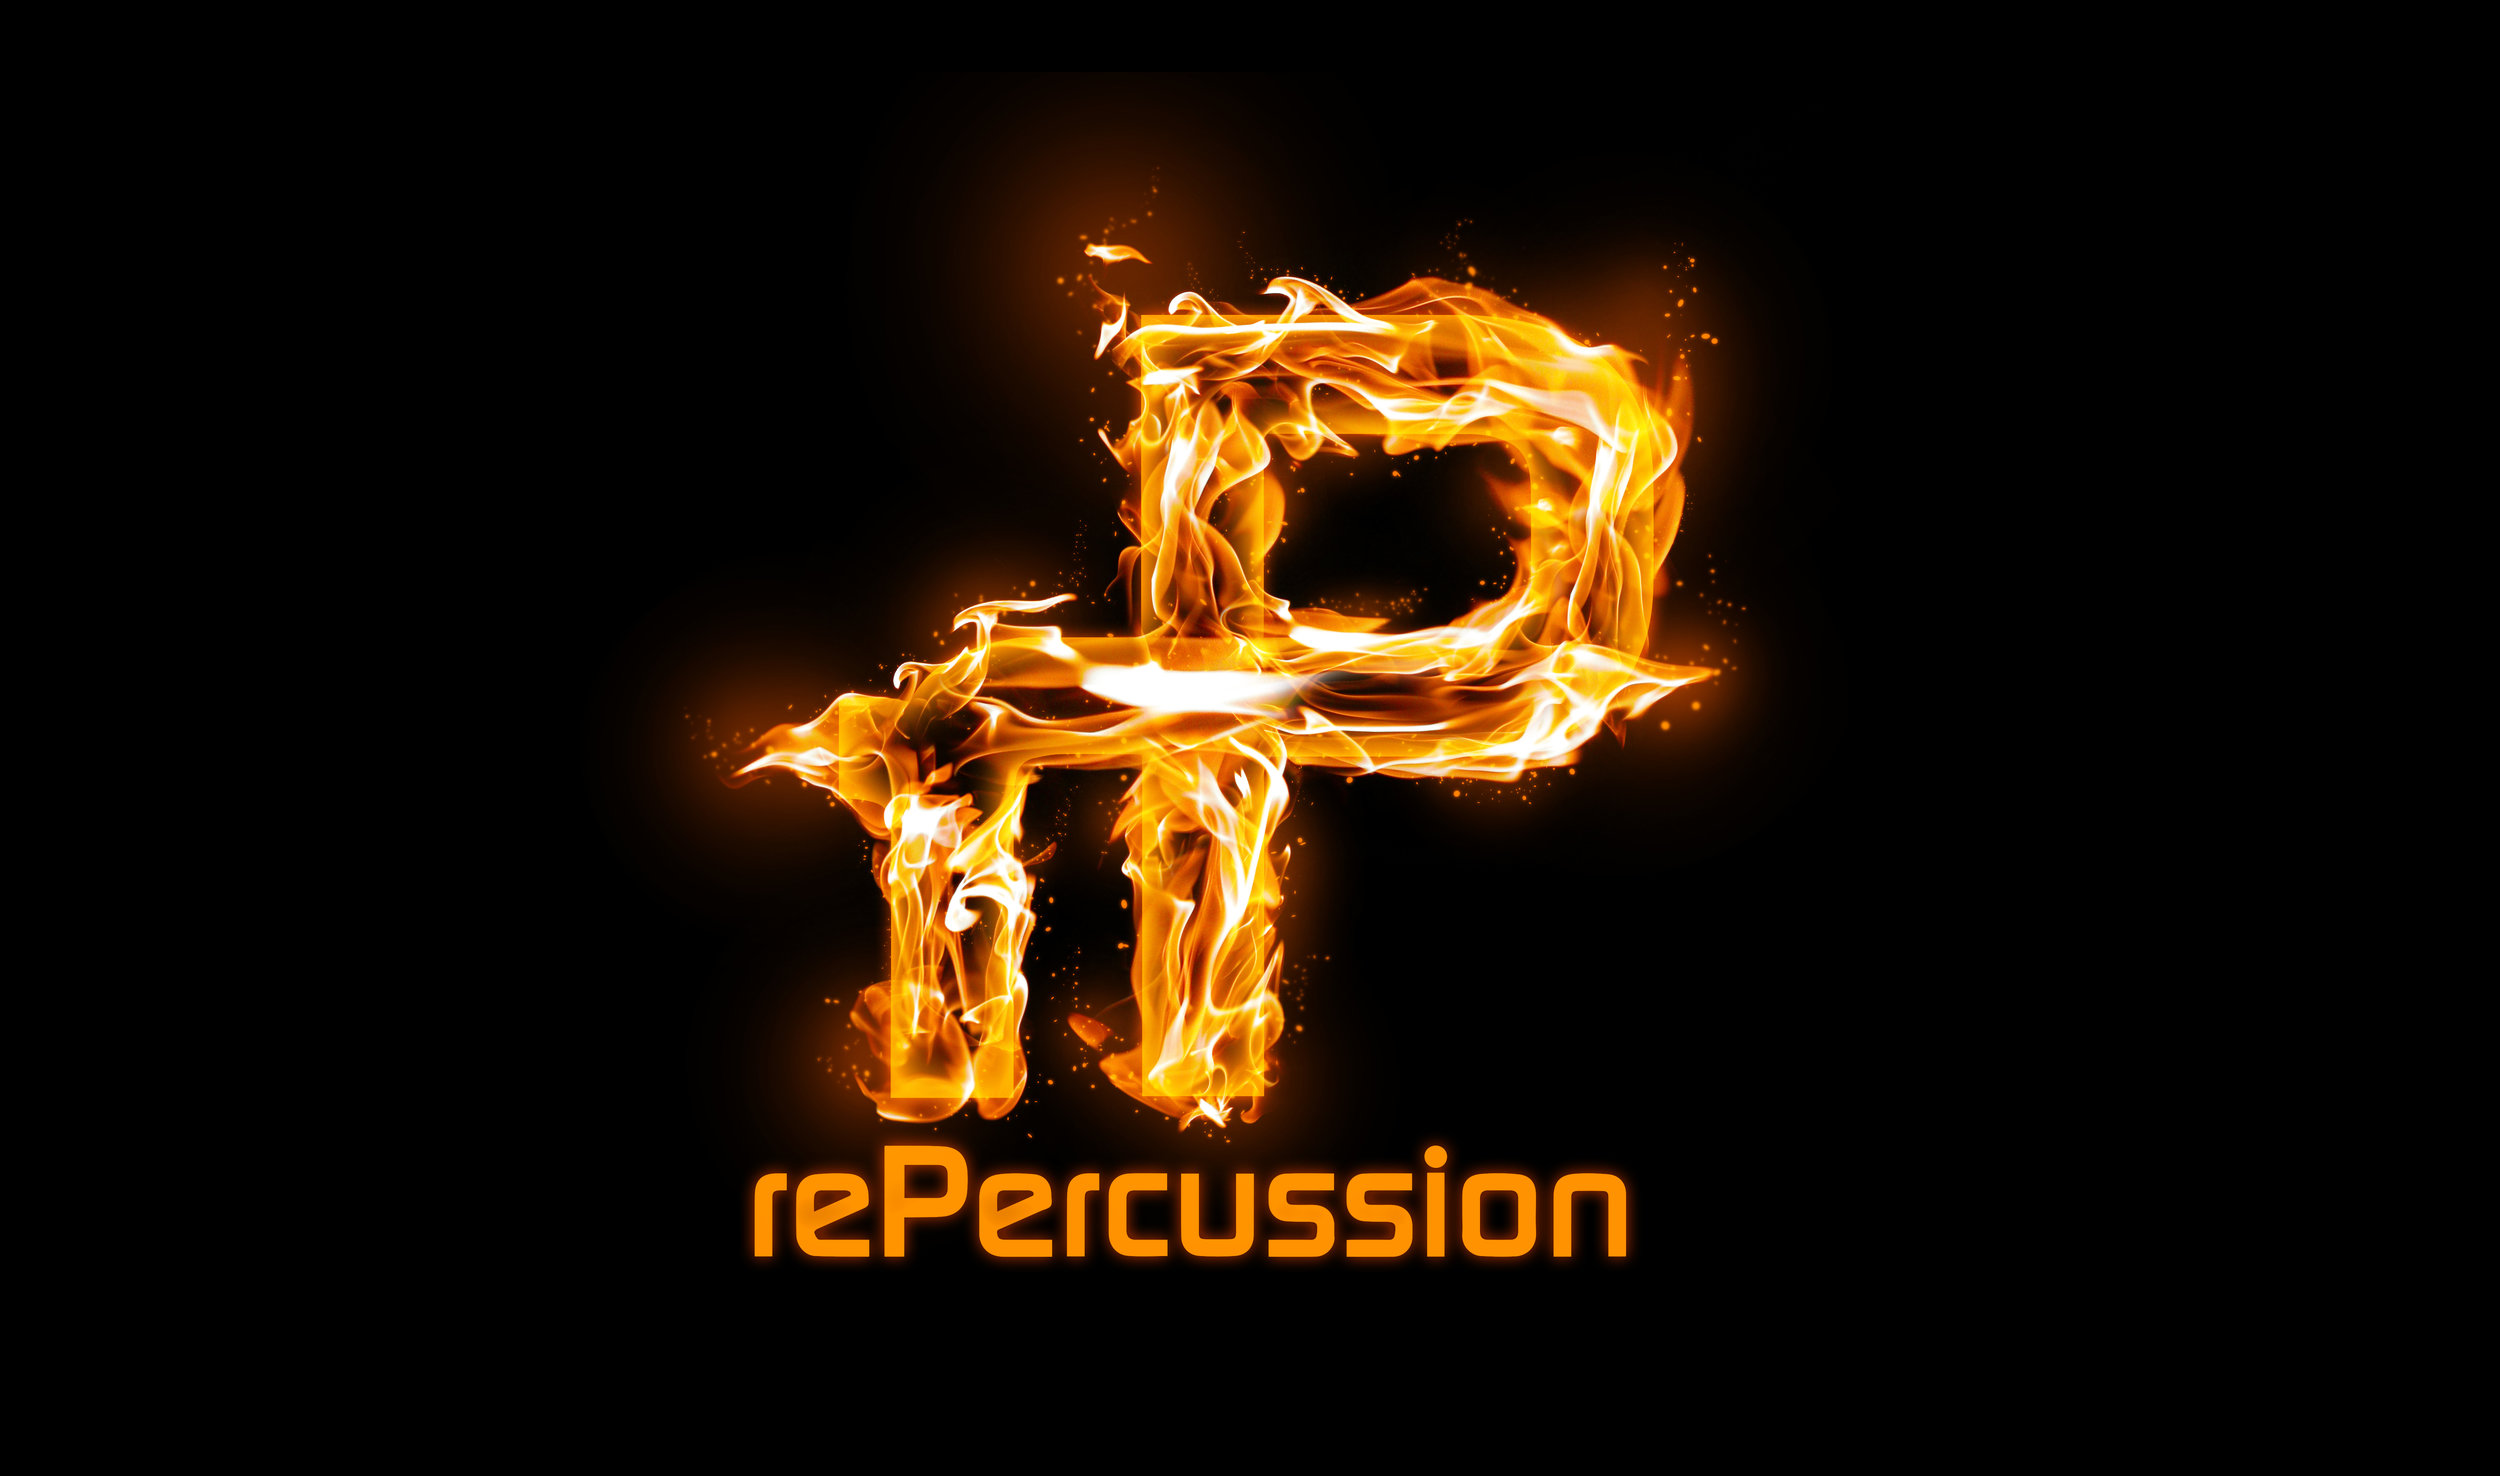 RePercussion fire.jpg